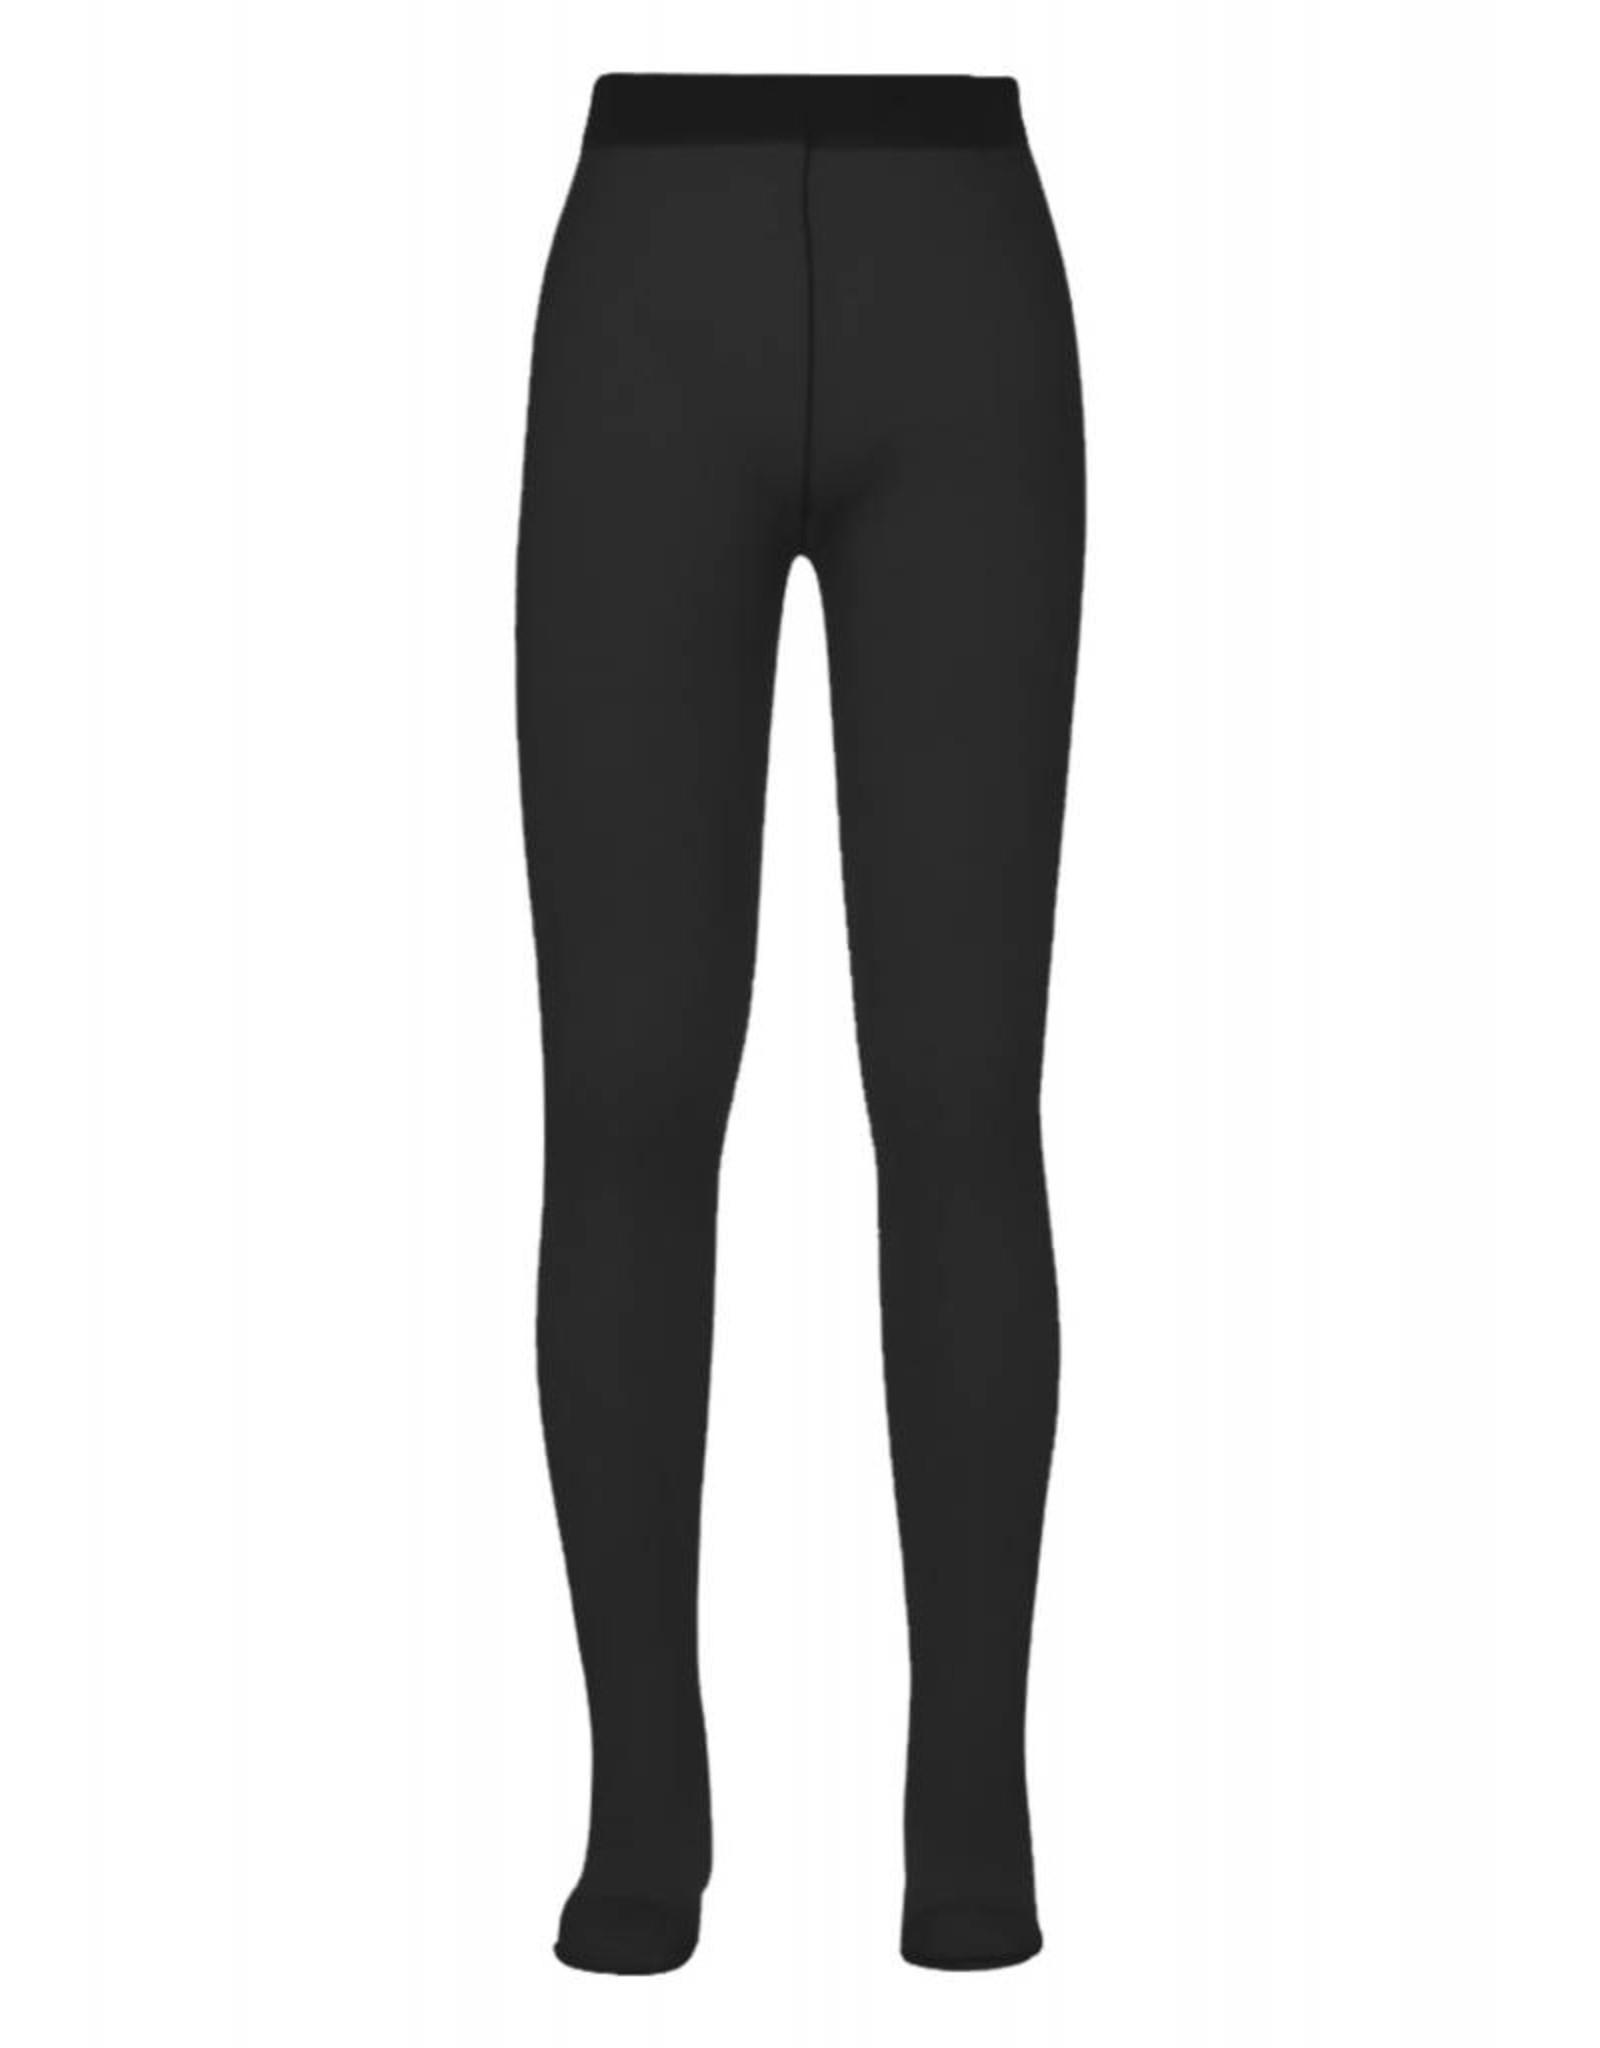 Quapi Quapi meisjes maillot LOREEN Black